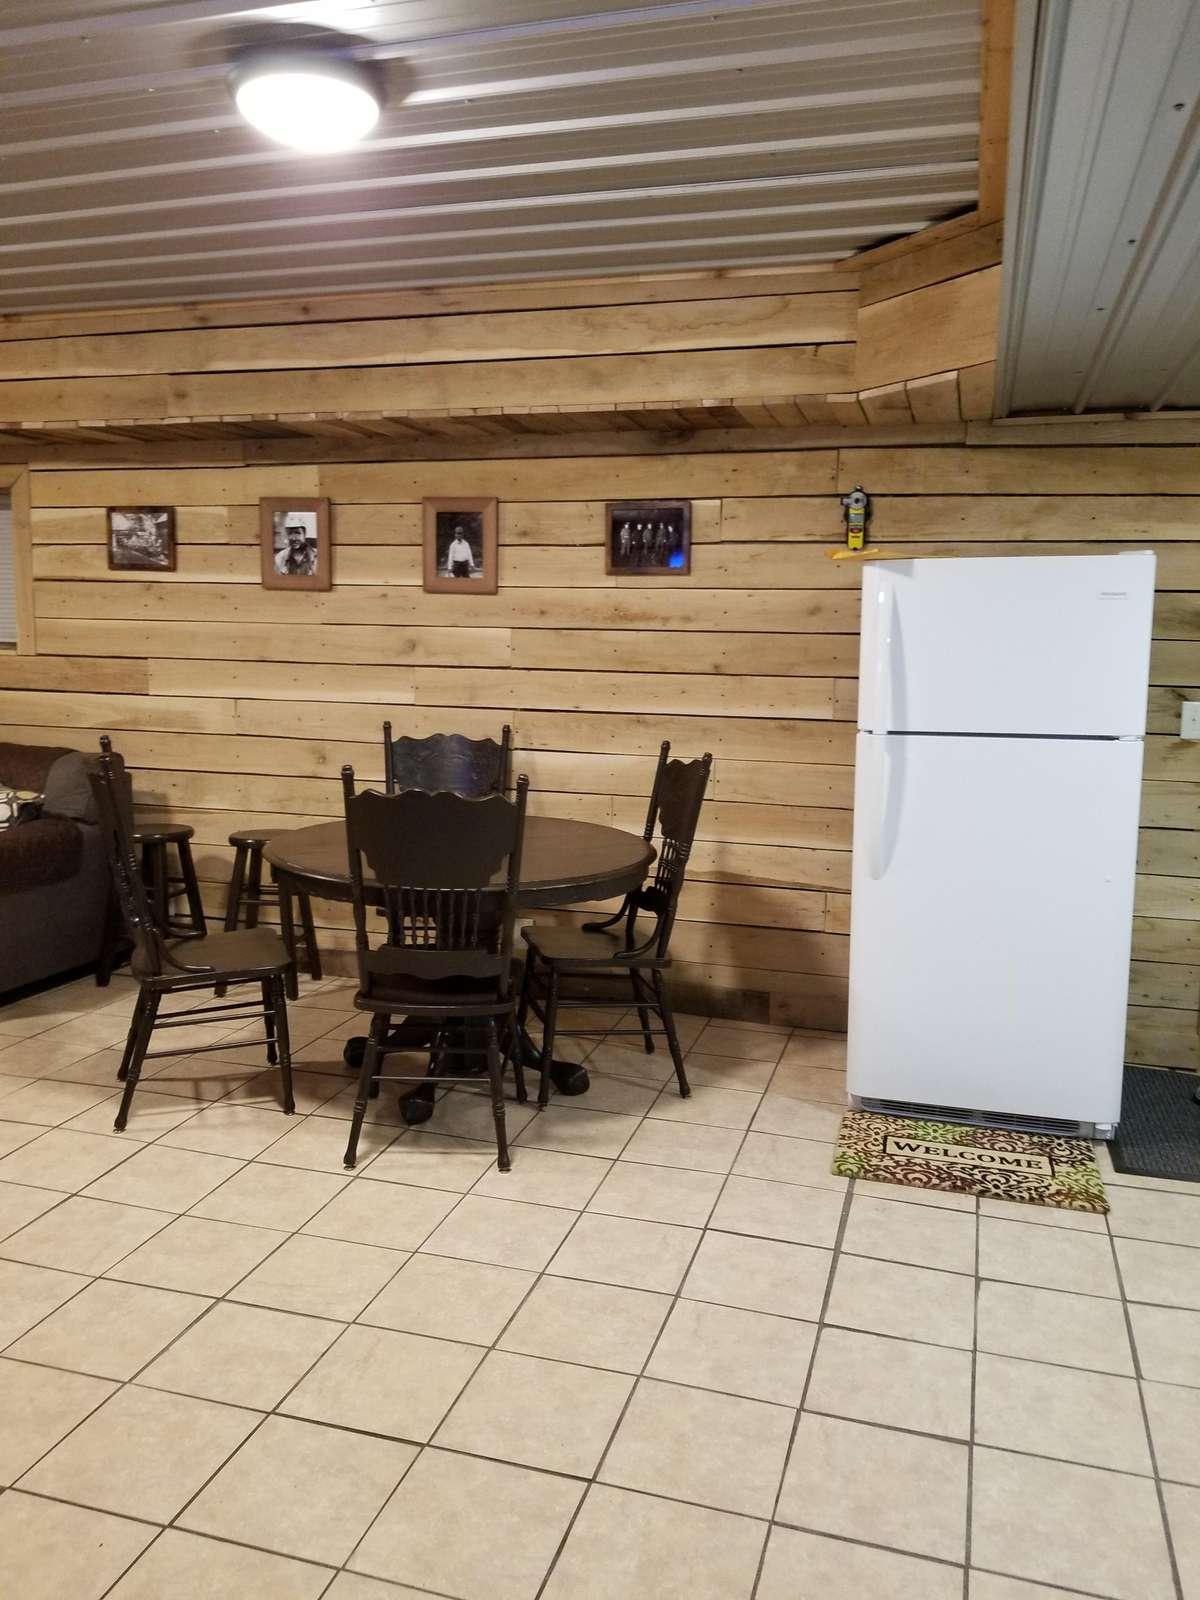 Dining area and refrigerator/freezer